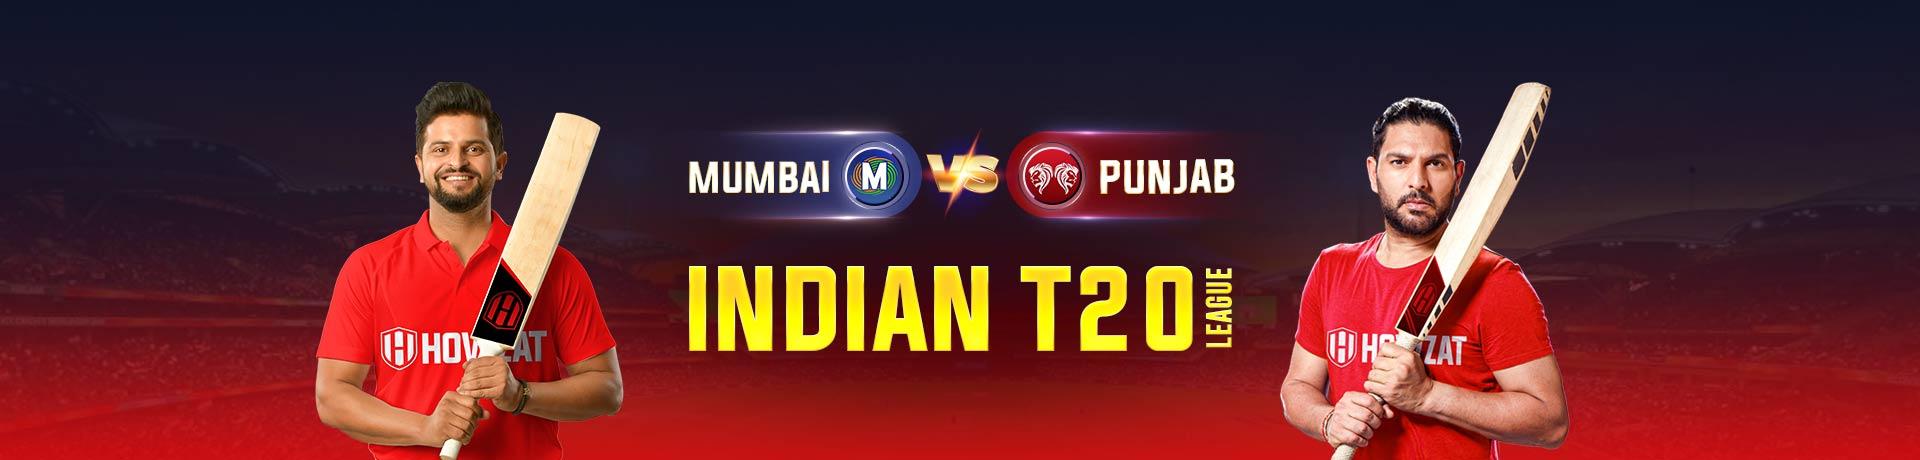 Mumbai vs Punjab Indian T20 League